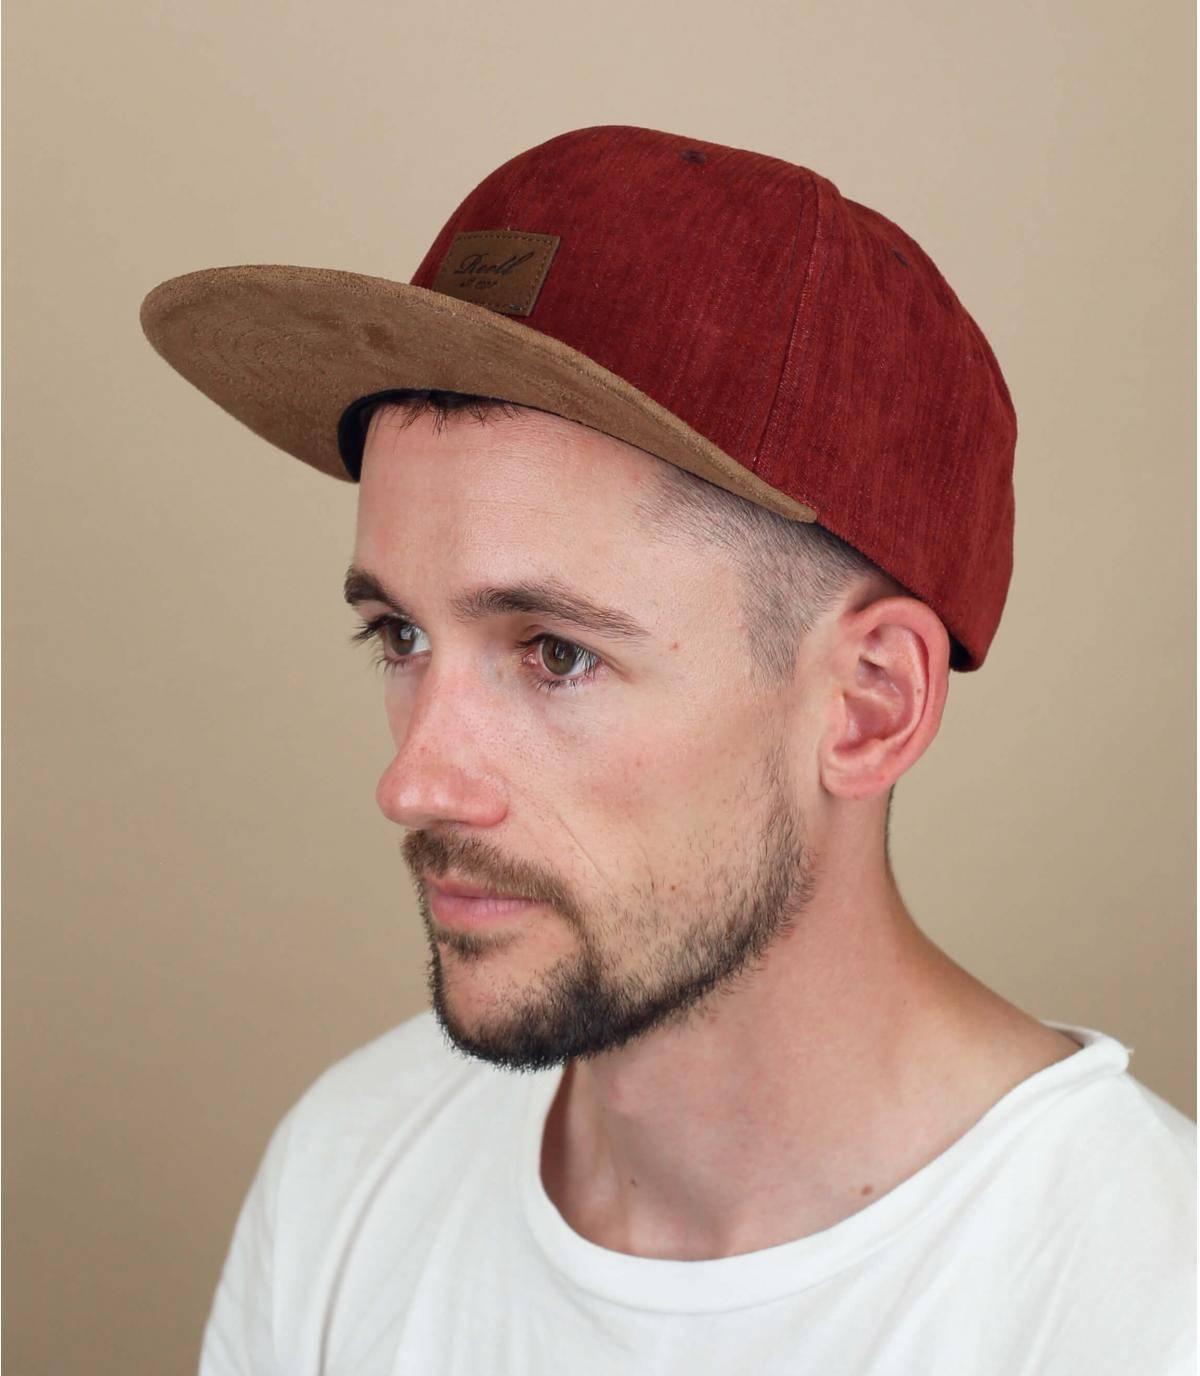 burgundy Reell cap